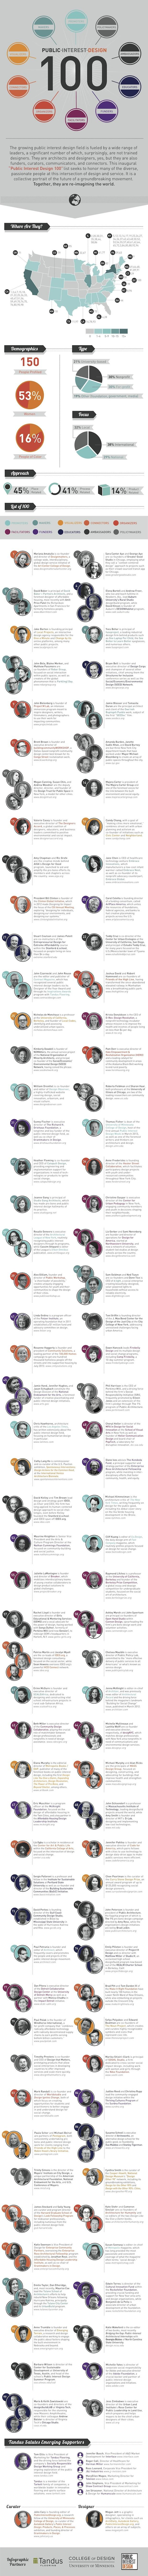 100-leaders-in-public-interest-design_50bf9df20b1b6